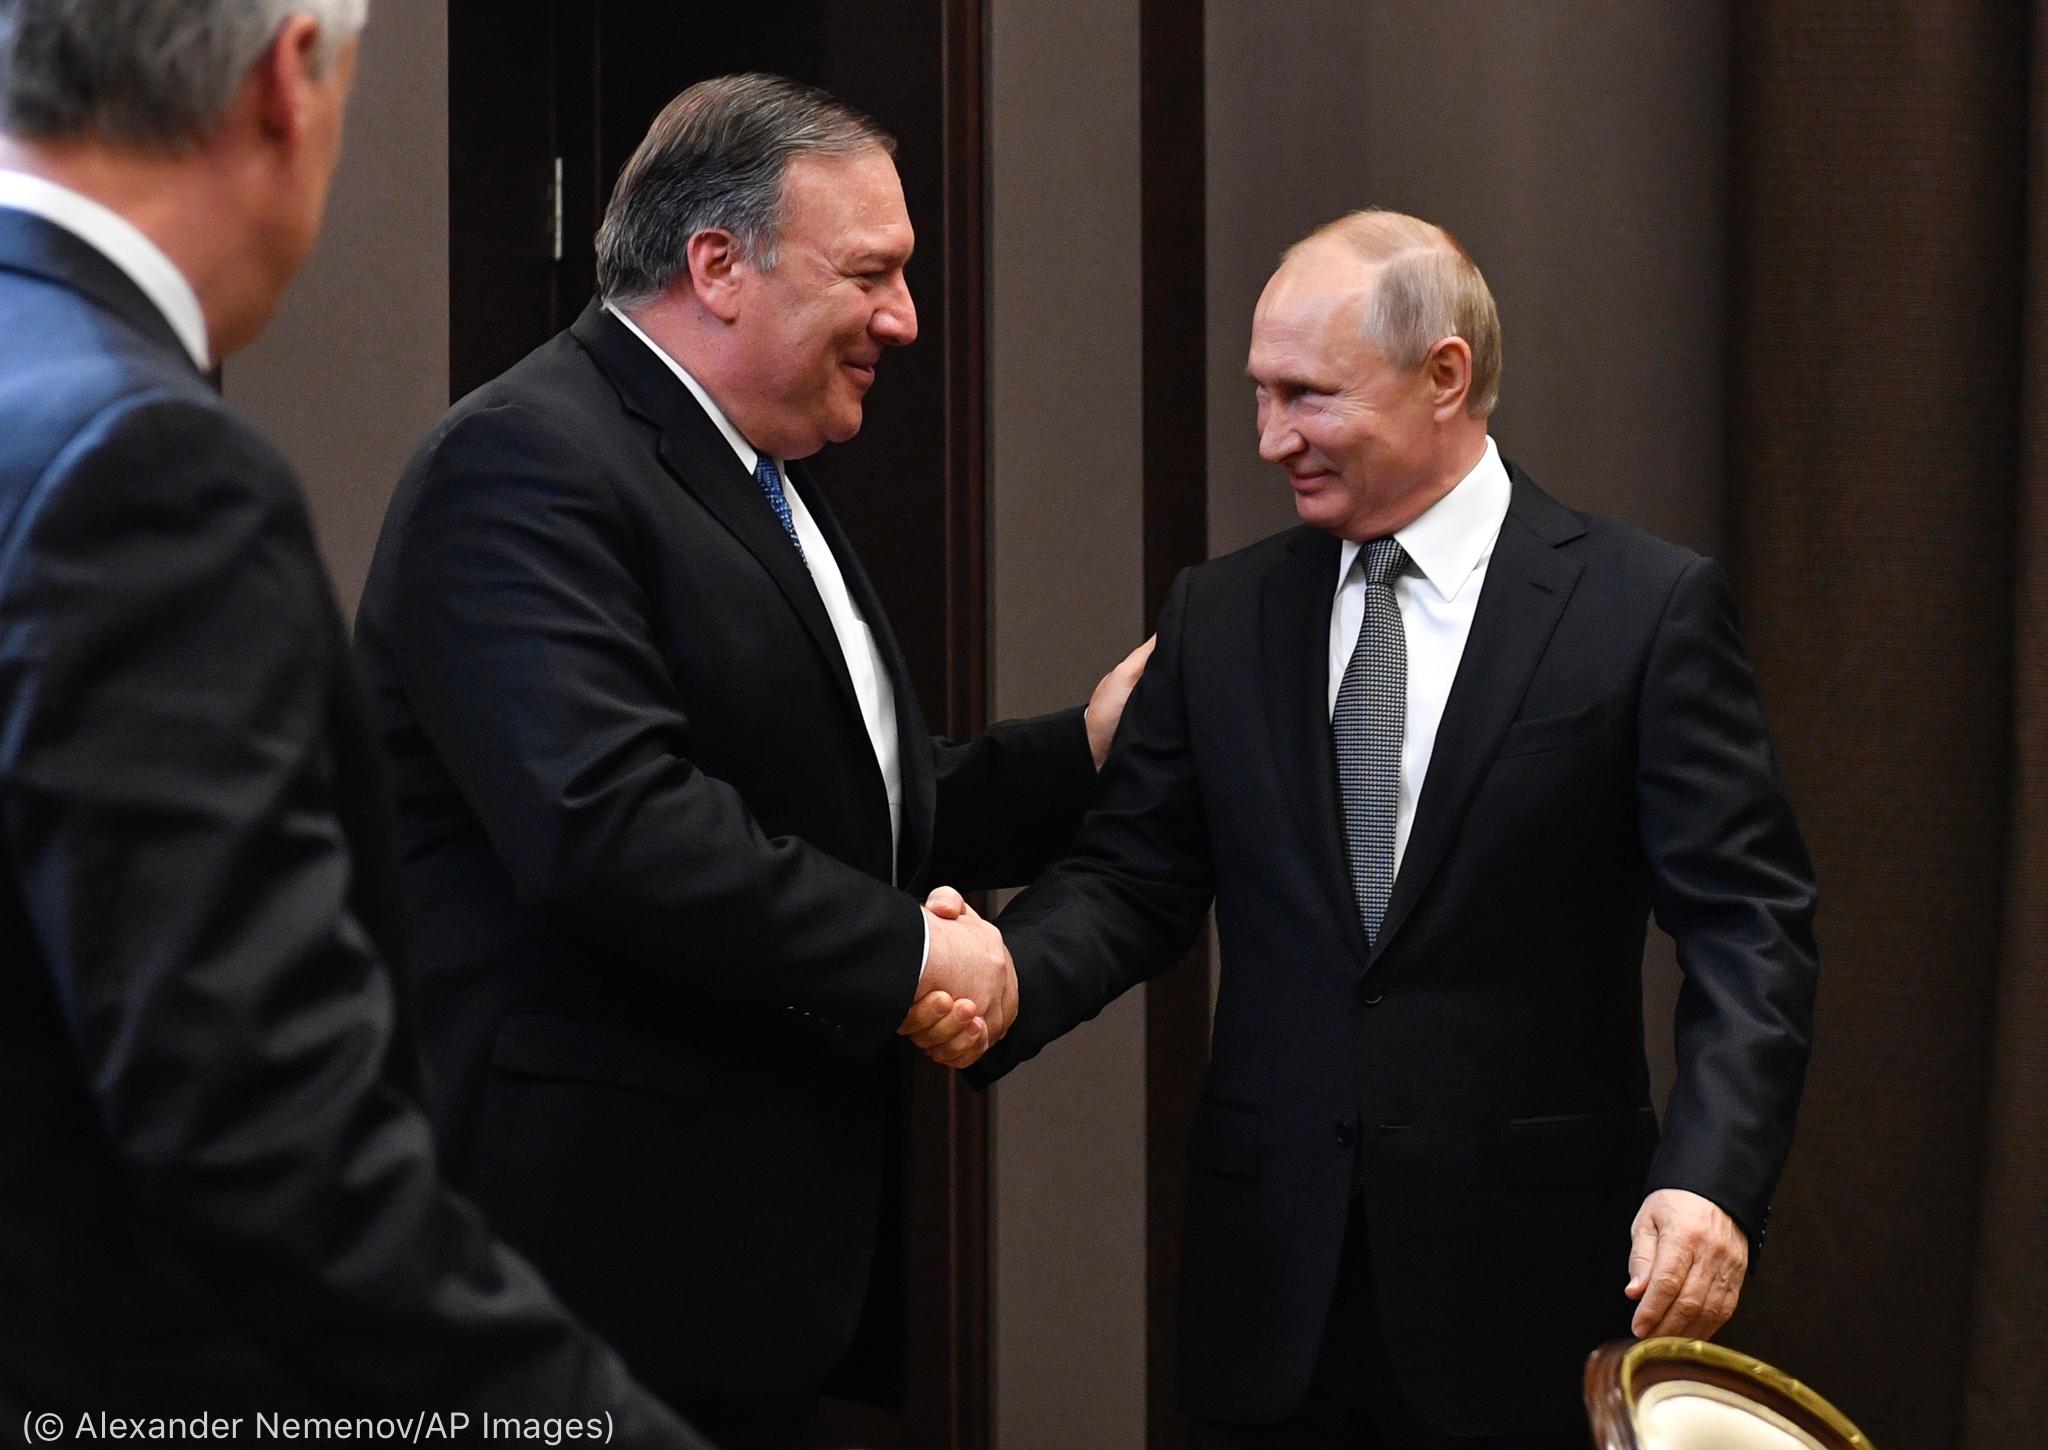 Secretário Pompeo cumprimenta Vladimir Putin (© Alexander Nemenov/AP Images)